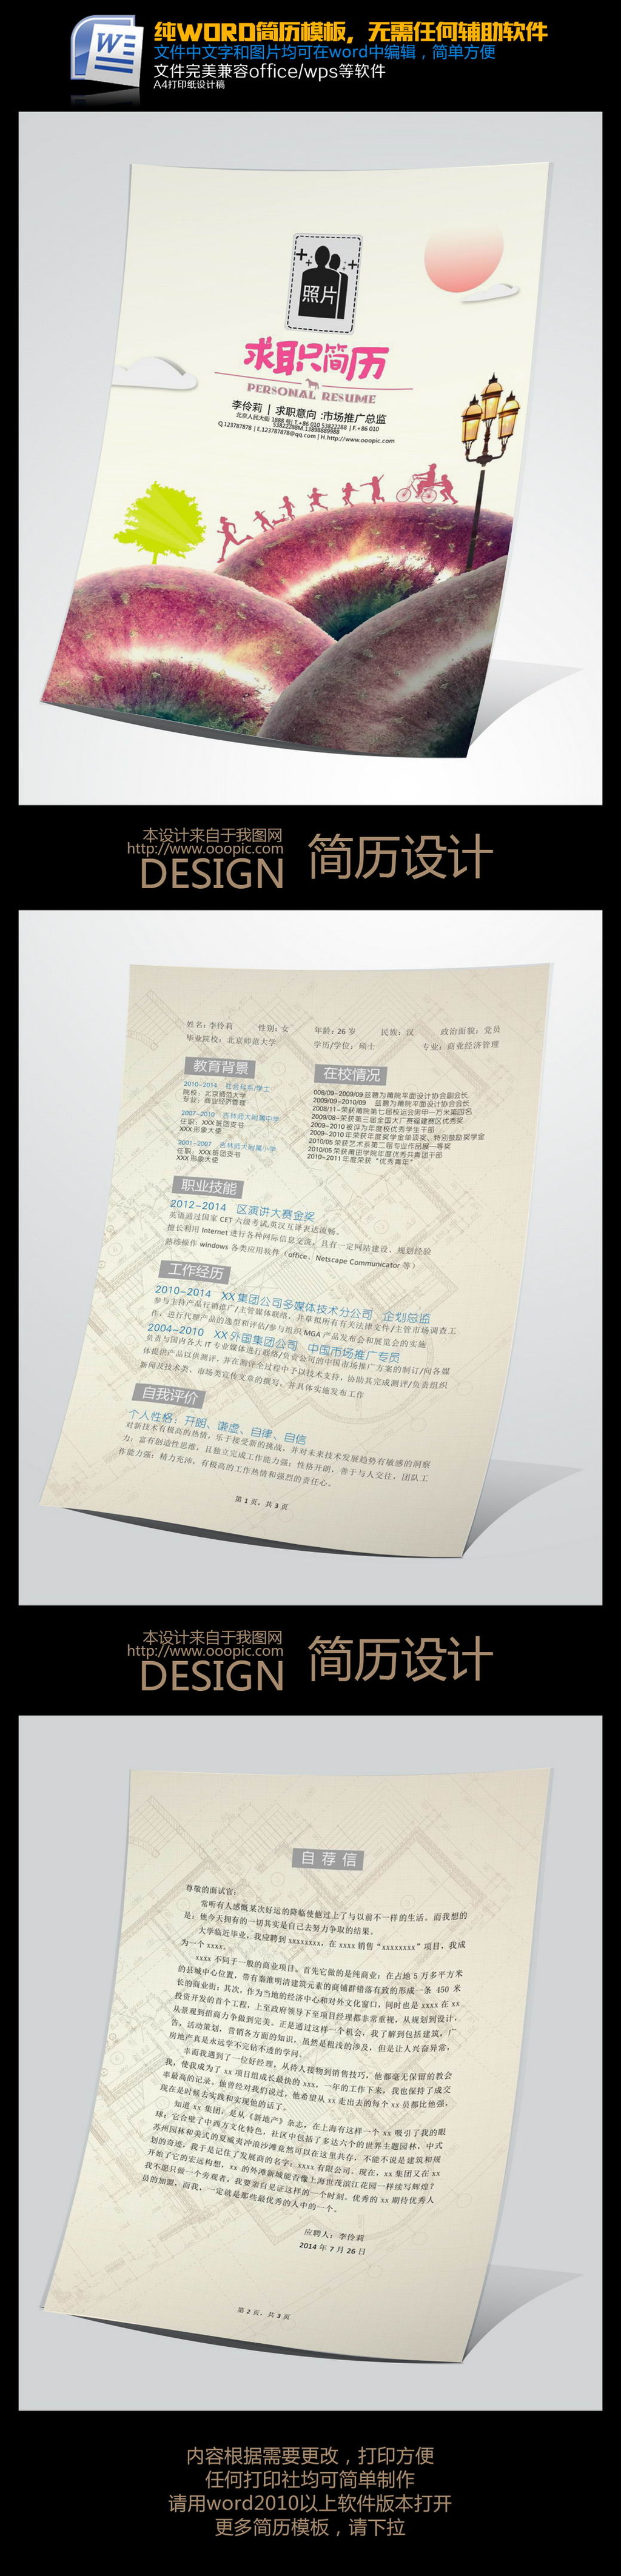 3pword中国风建筑工程师地产设计简历模板下载